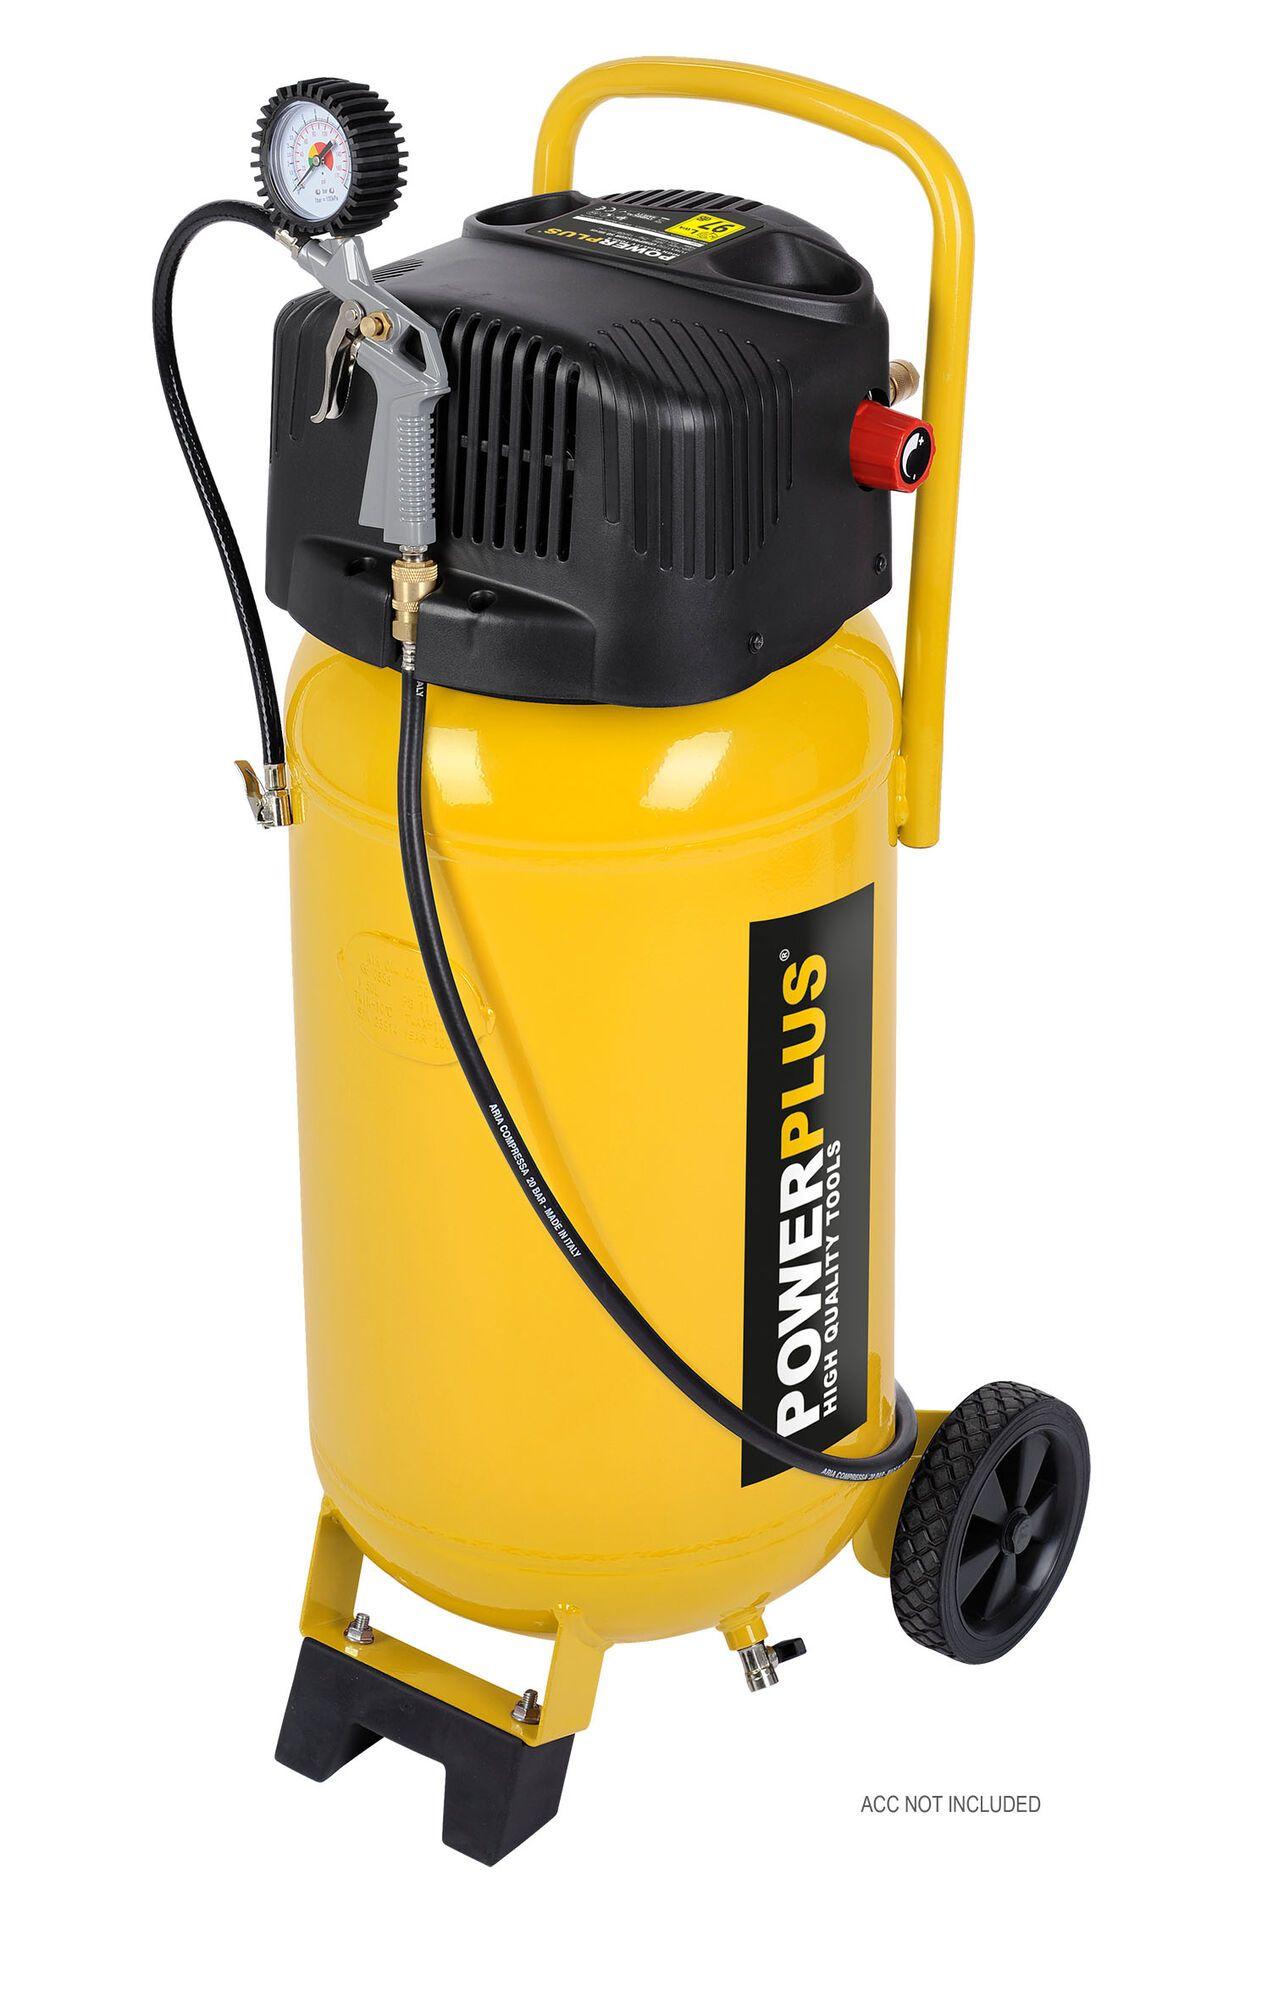 Powerplus POWX1750 Mobiele 1500W olievrije compressor met 50 liter tank (compressoren)